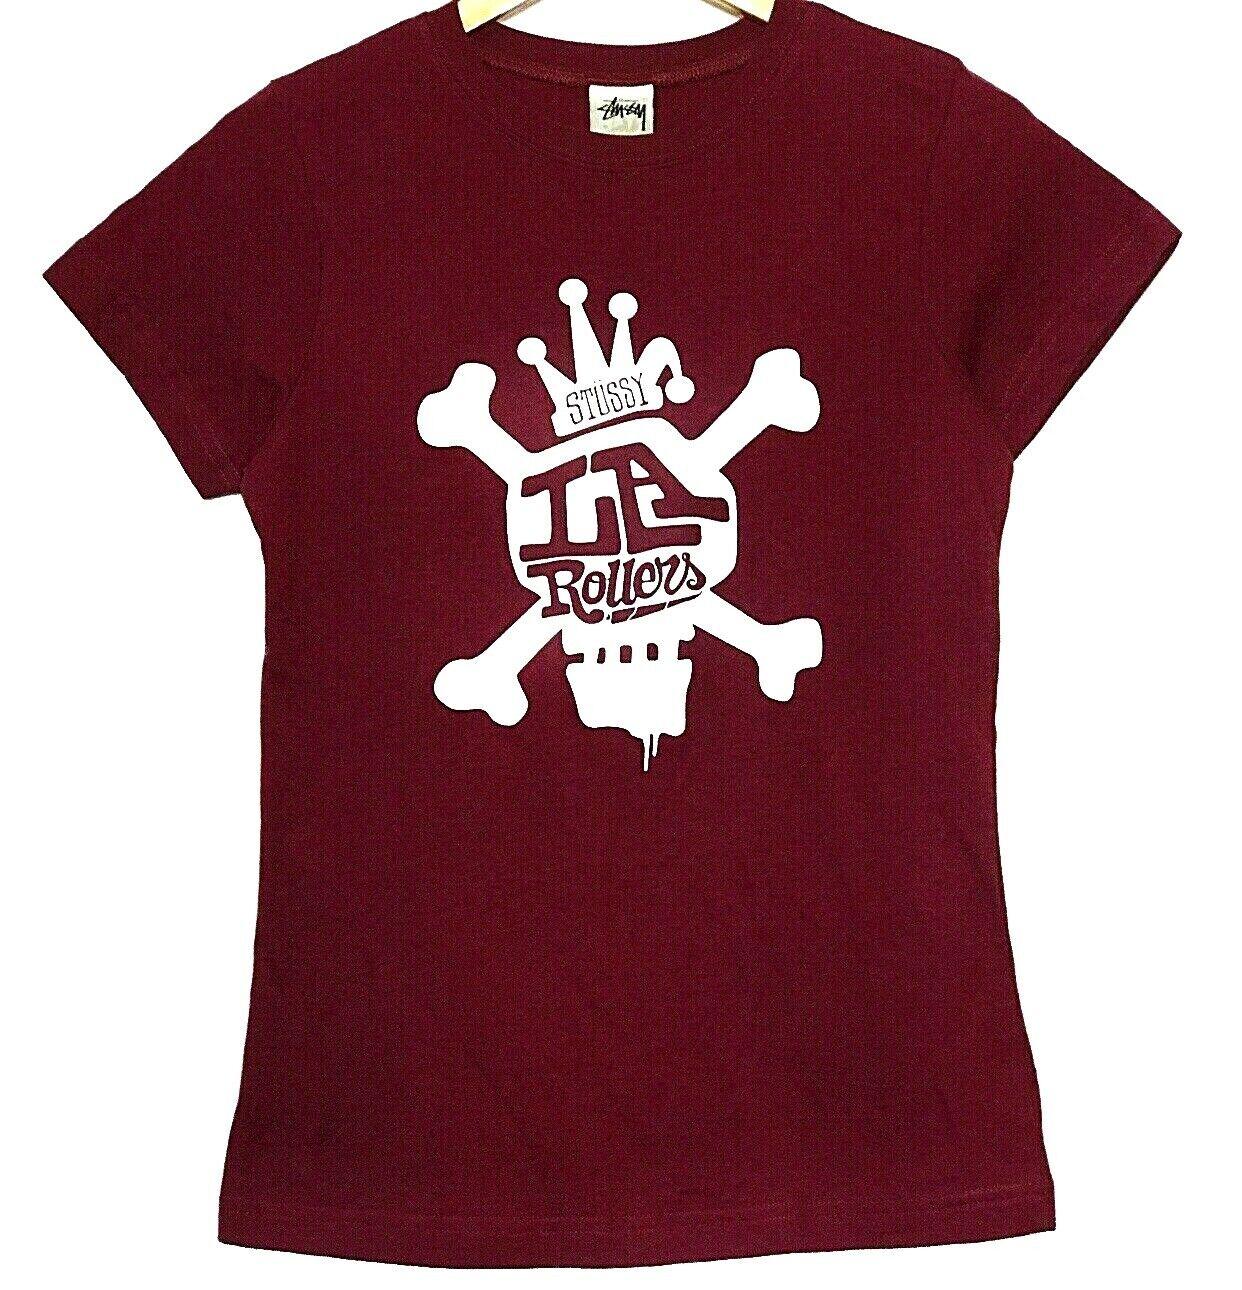 NEW Stussy Women T Shirt Medium LA Rollers Skull Crossbones Streetwear Burgundy